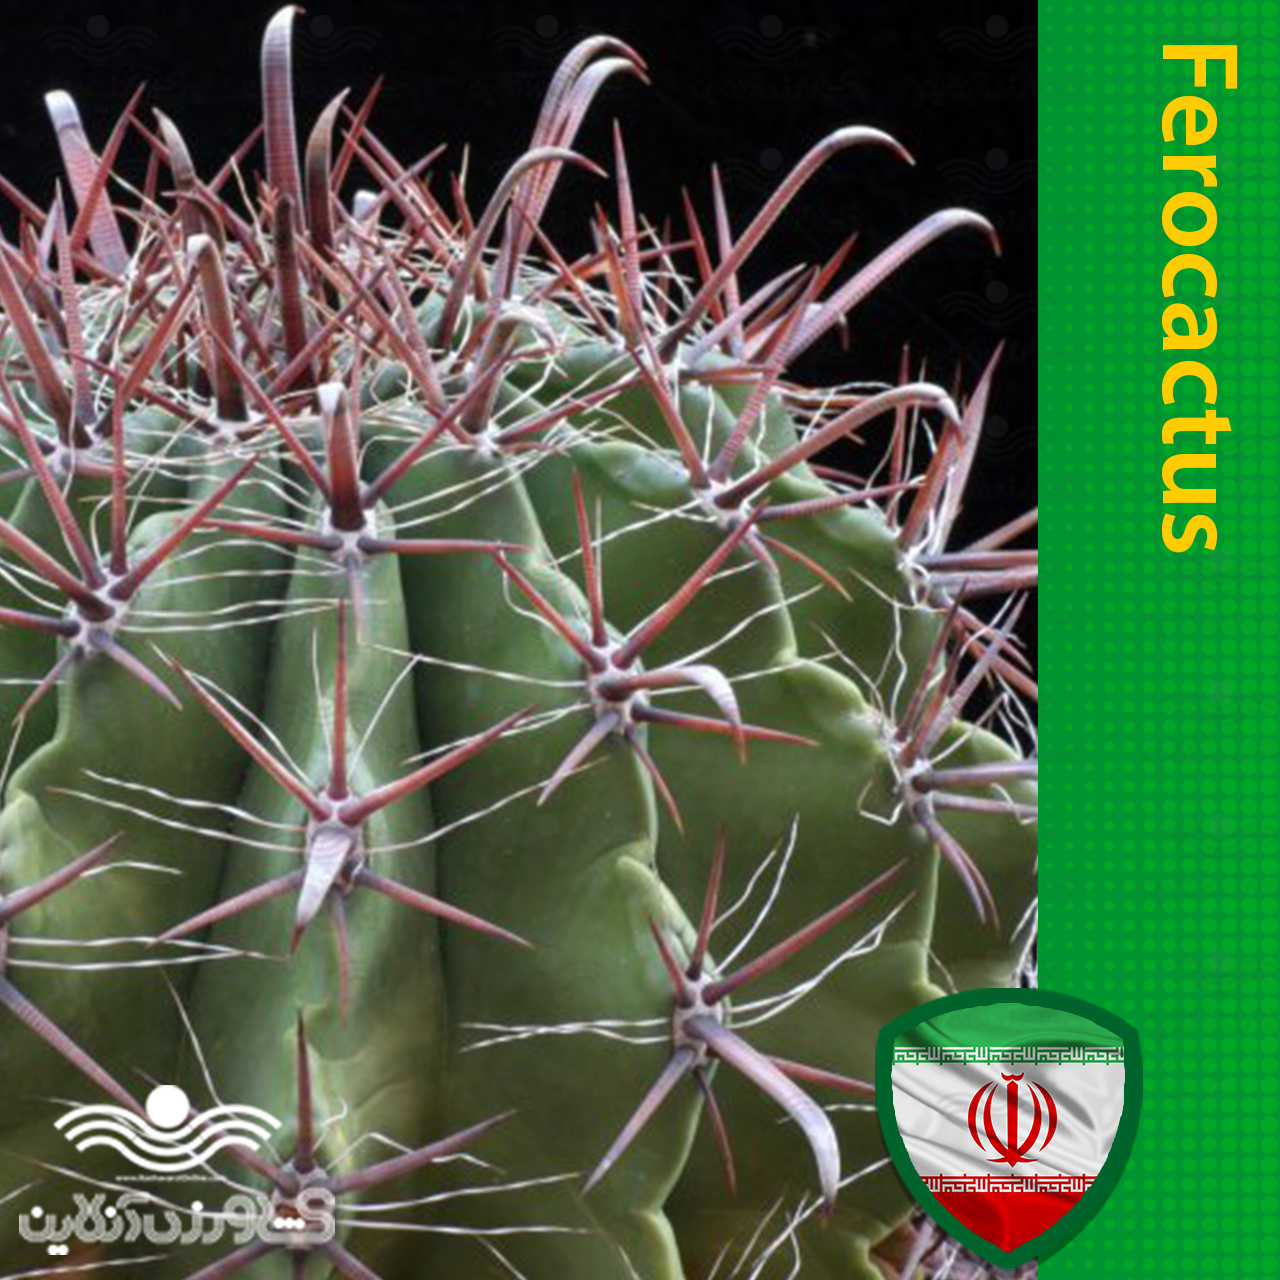 بذر فرو کاکتوس و روش تکثیر و نگهداری فرو کاکتوس